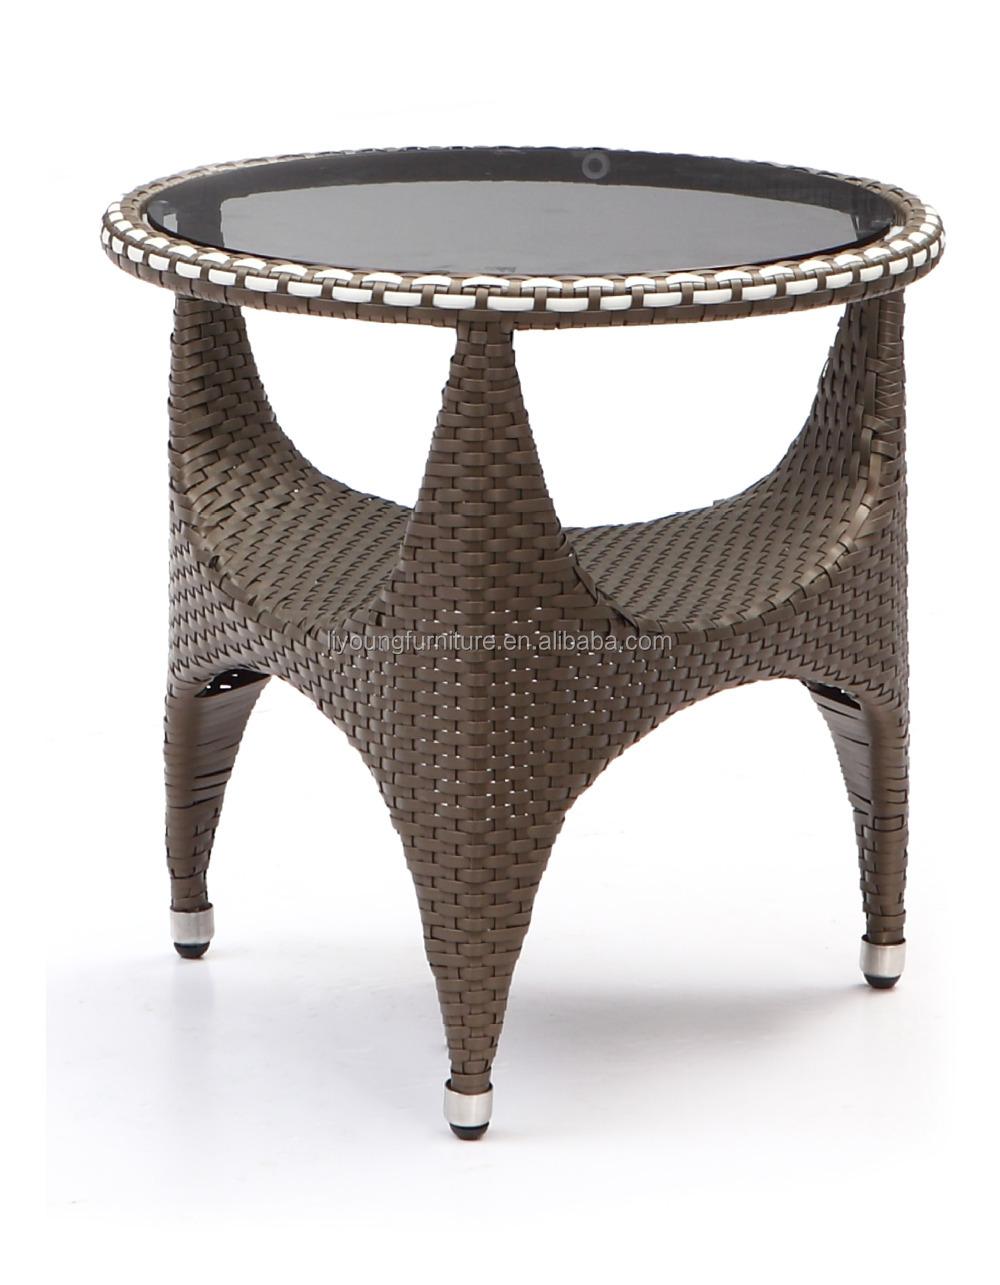 Small Round Rattan Table Latest Design Outdoor Rattan Garden Furniture Modern Small Round